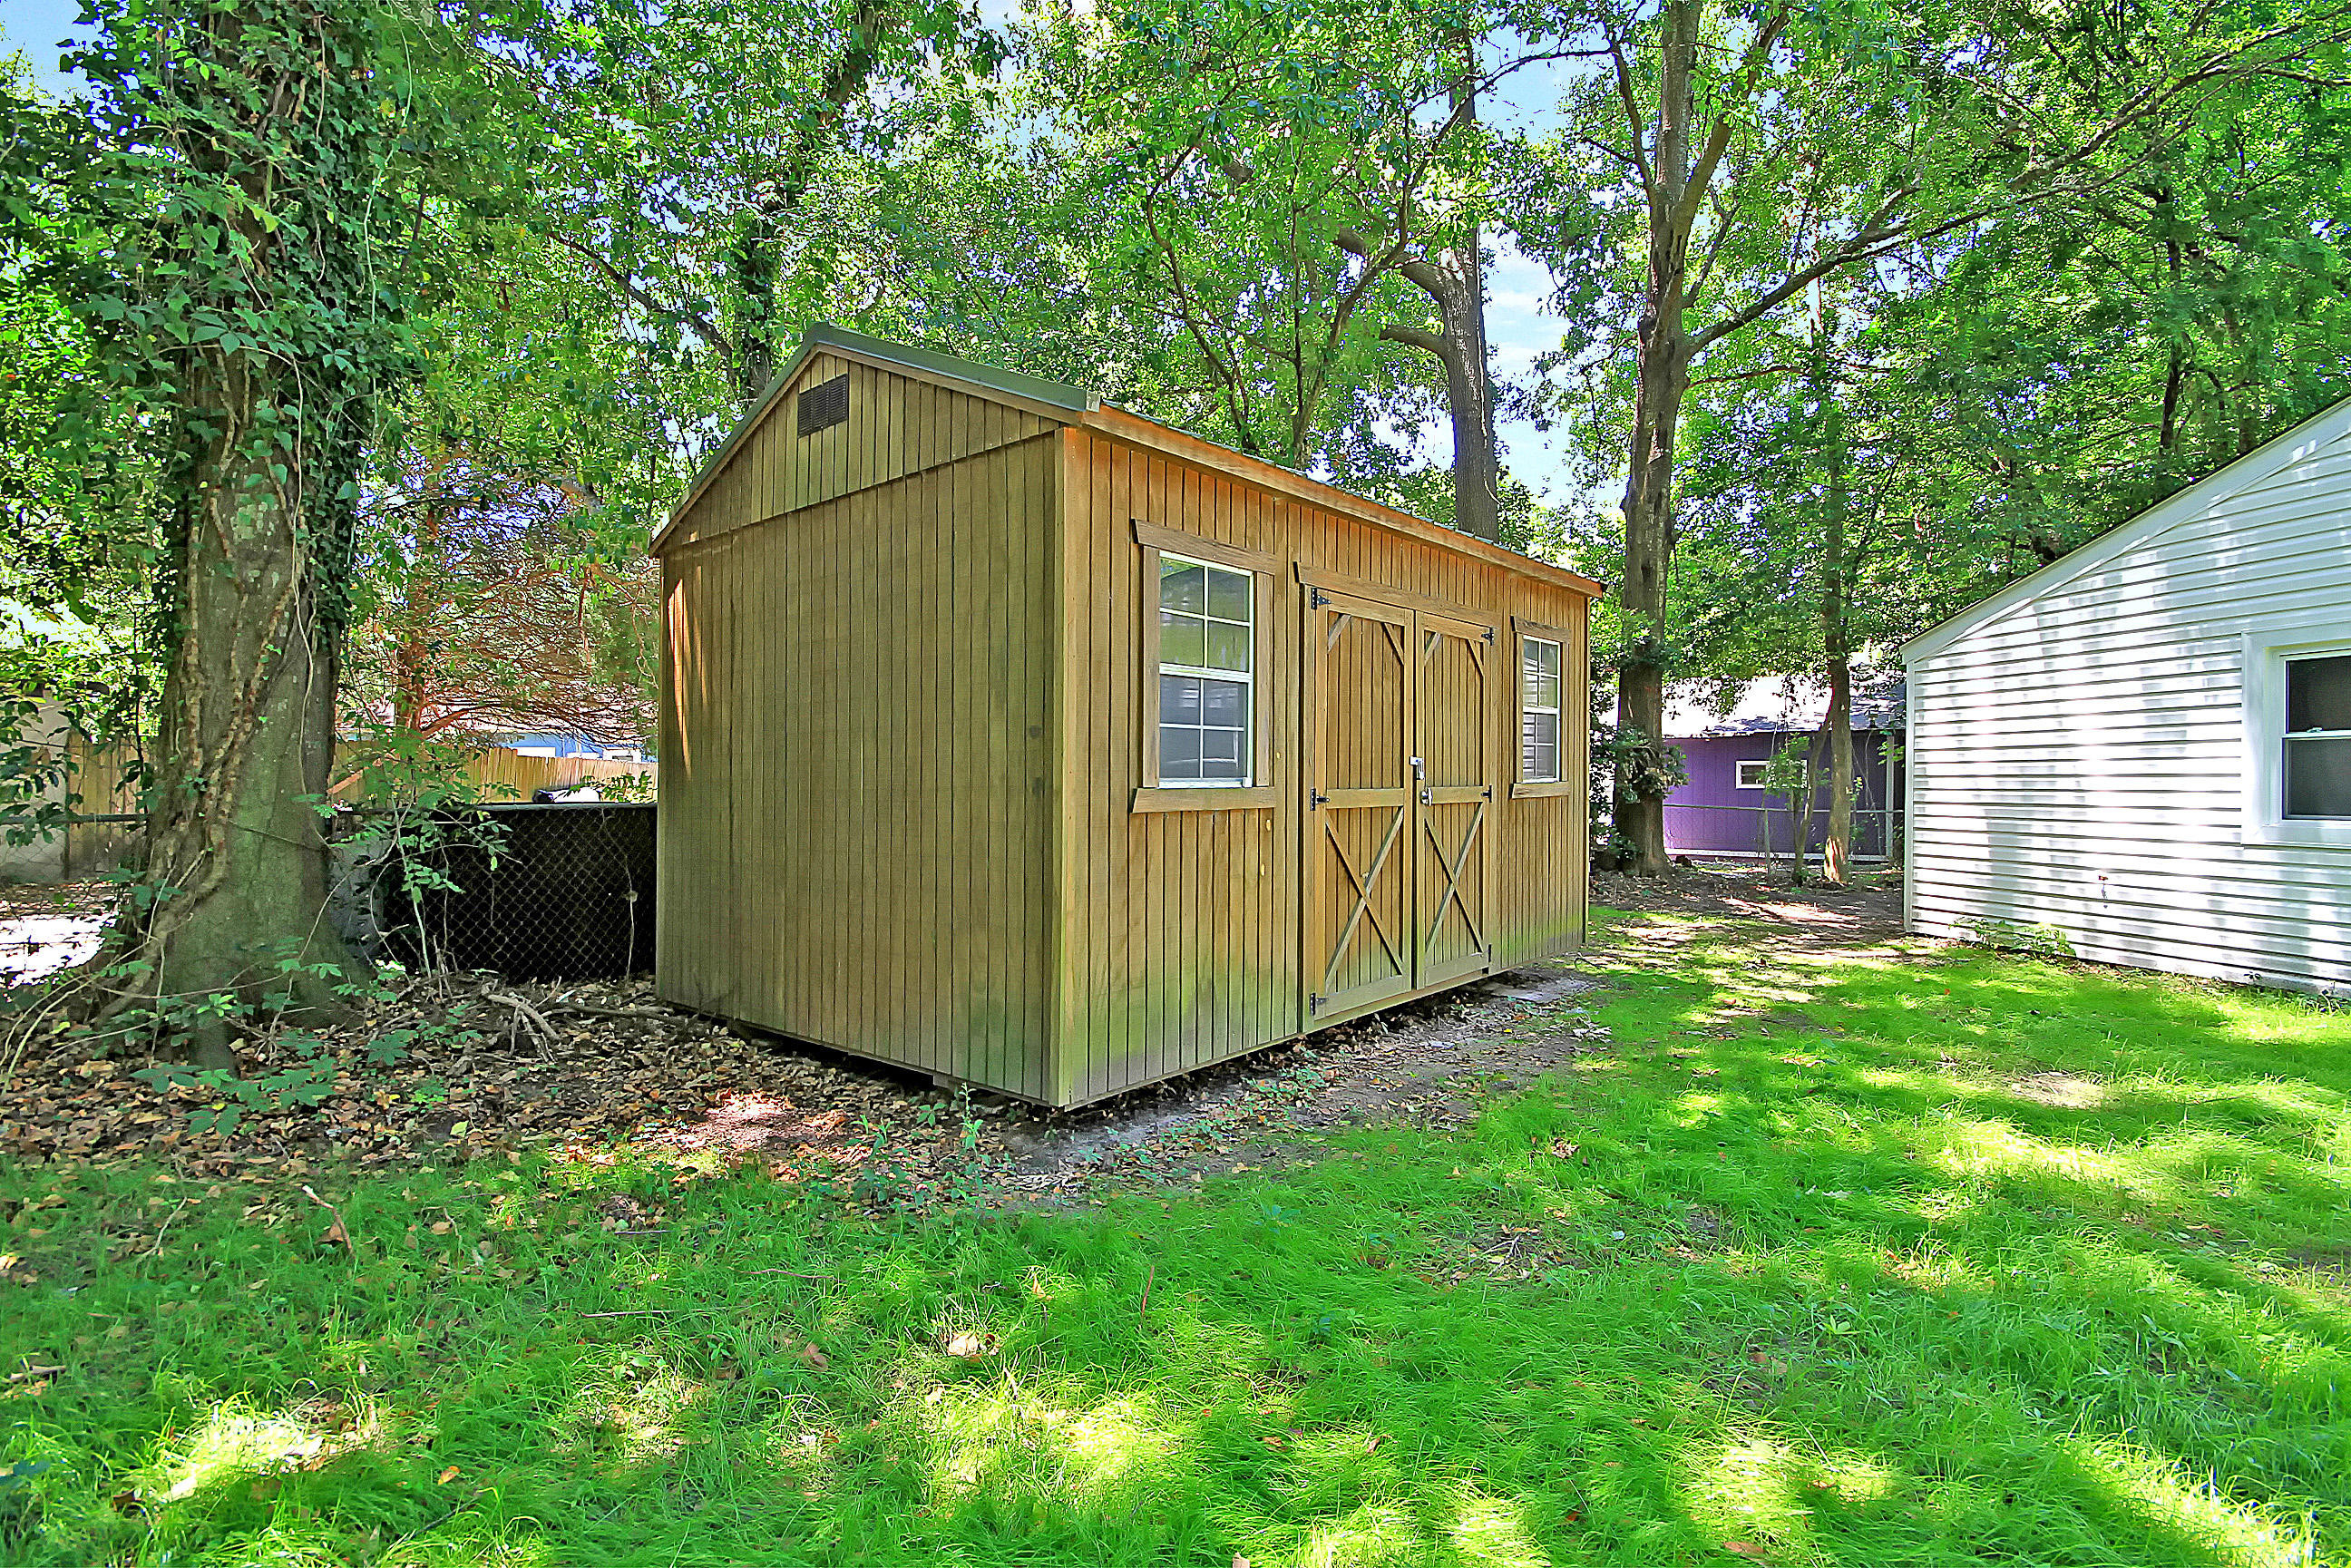 Yeamans Park Homes For Sale - 1207 Jones, Hanahan, SC - 27